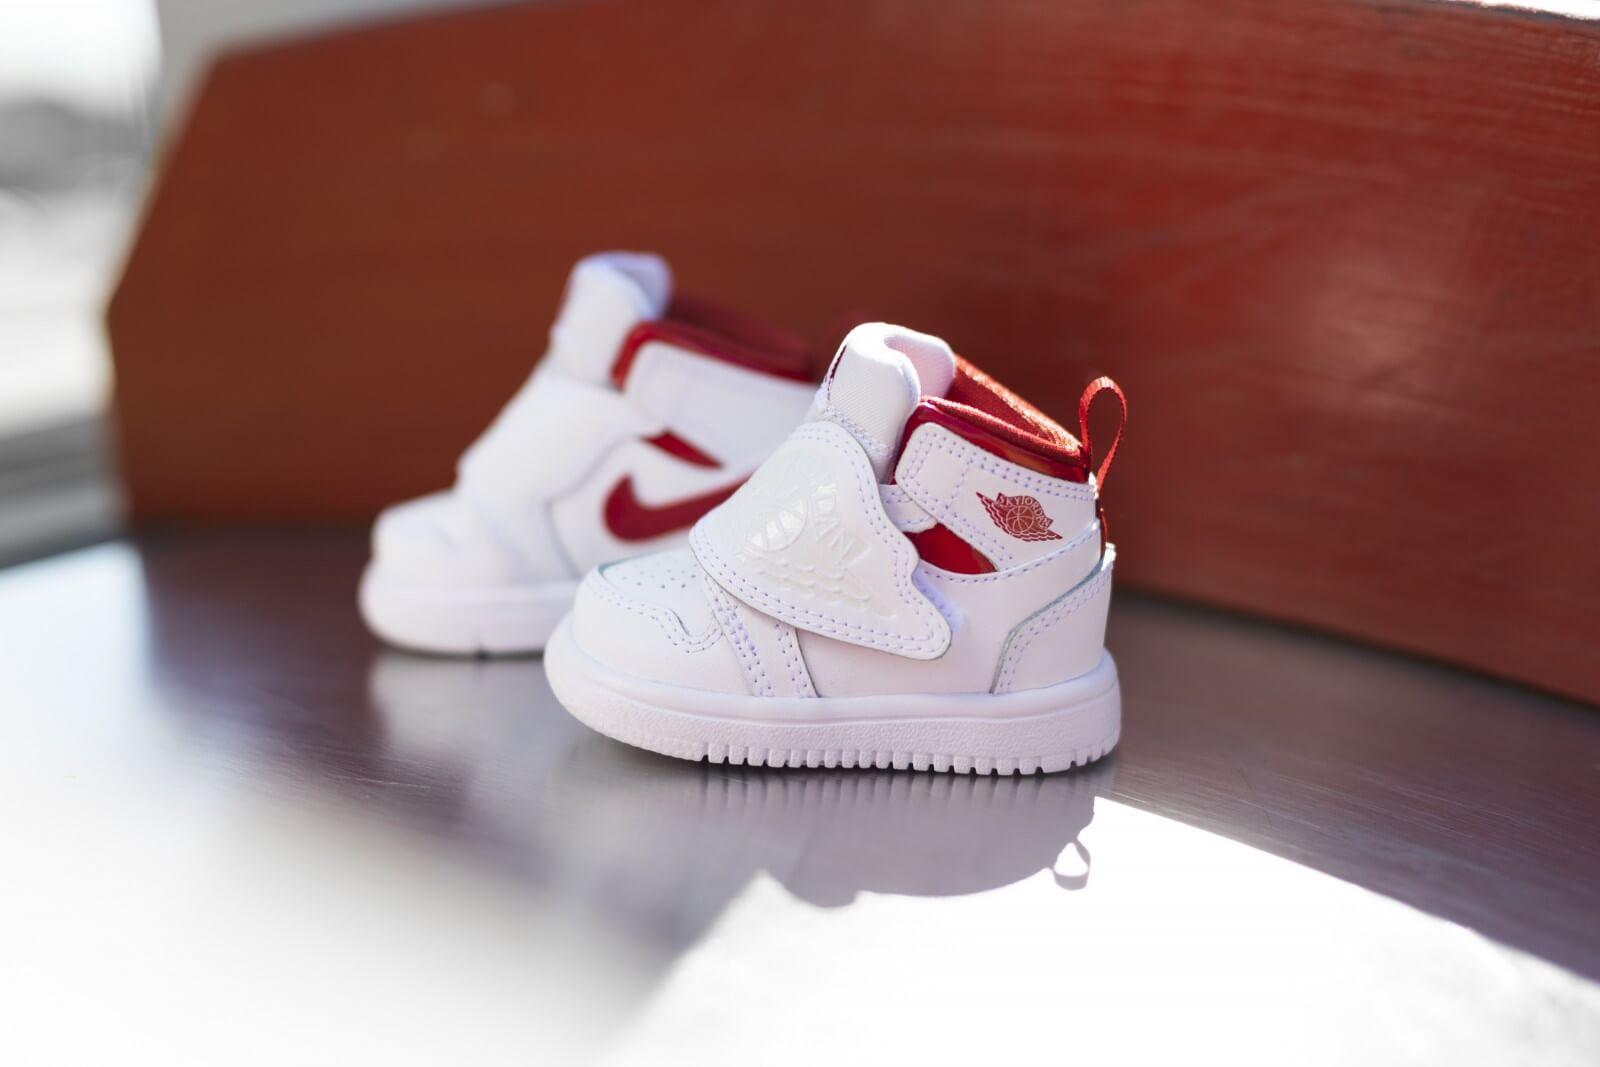 Nike Sky Jordan 1 TD White/University